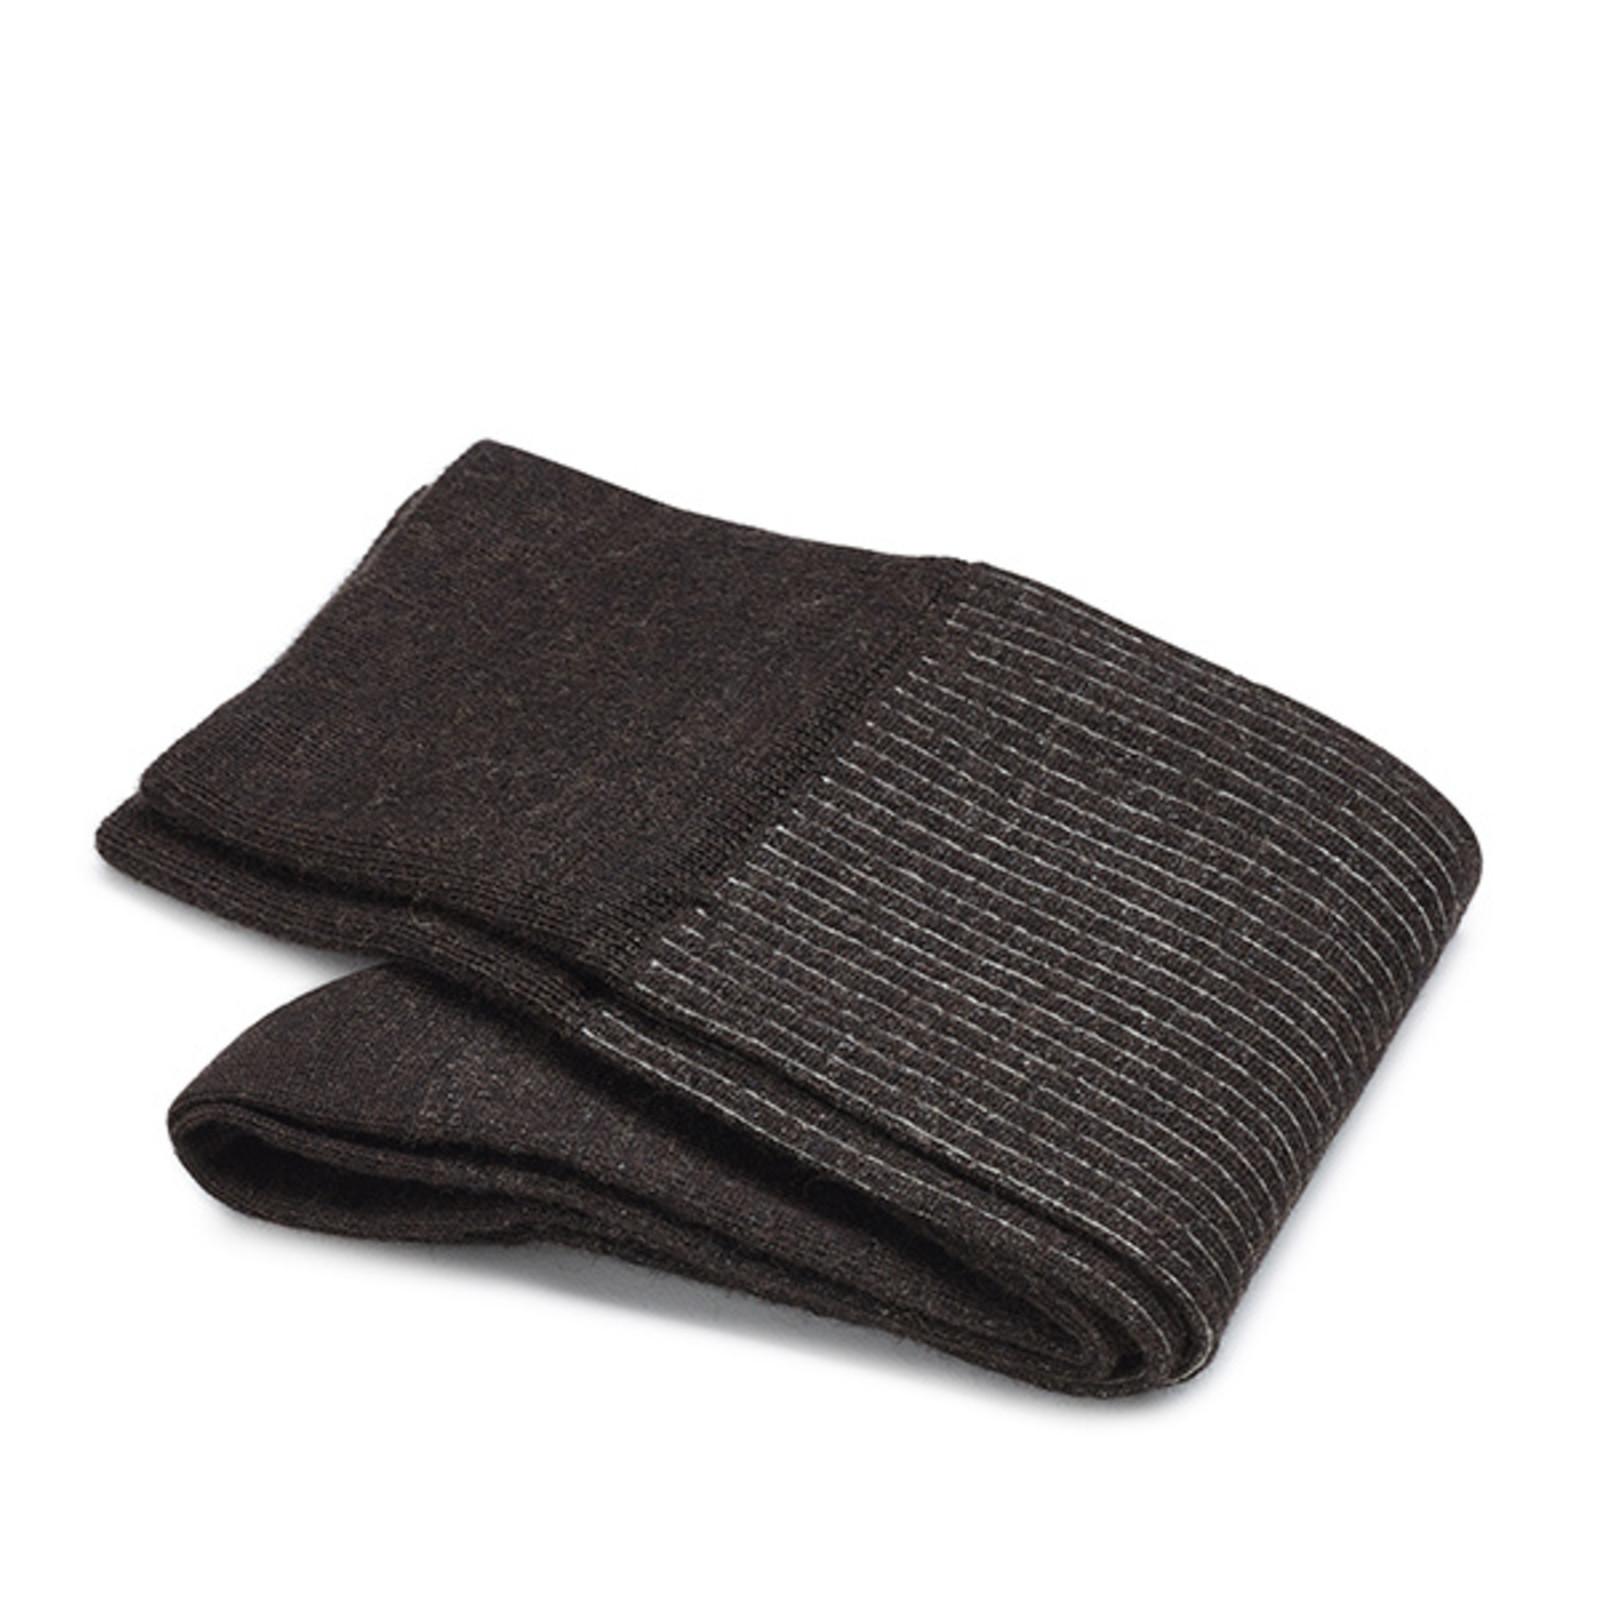 Carlo Lanza Braune Shadow Socken Merino Wolle